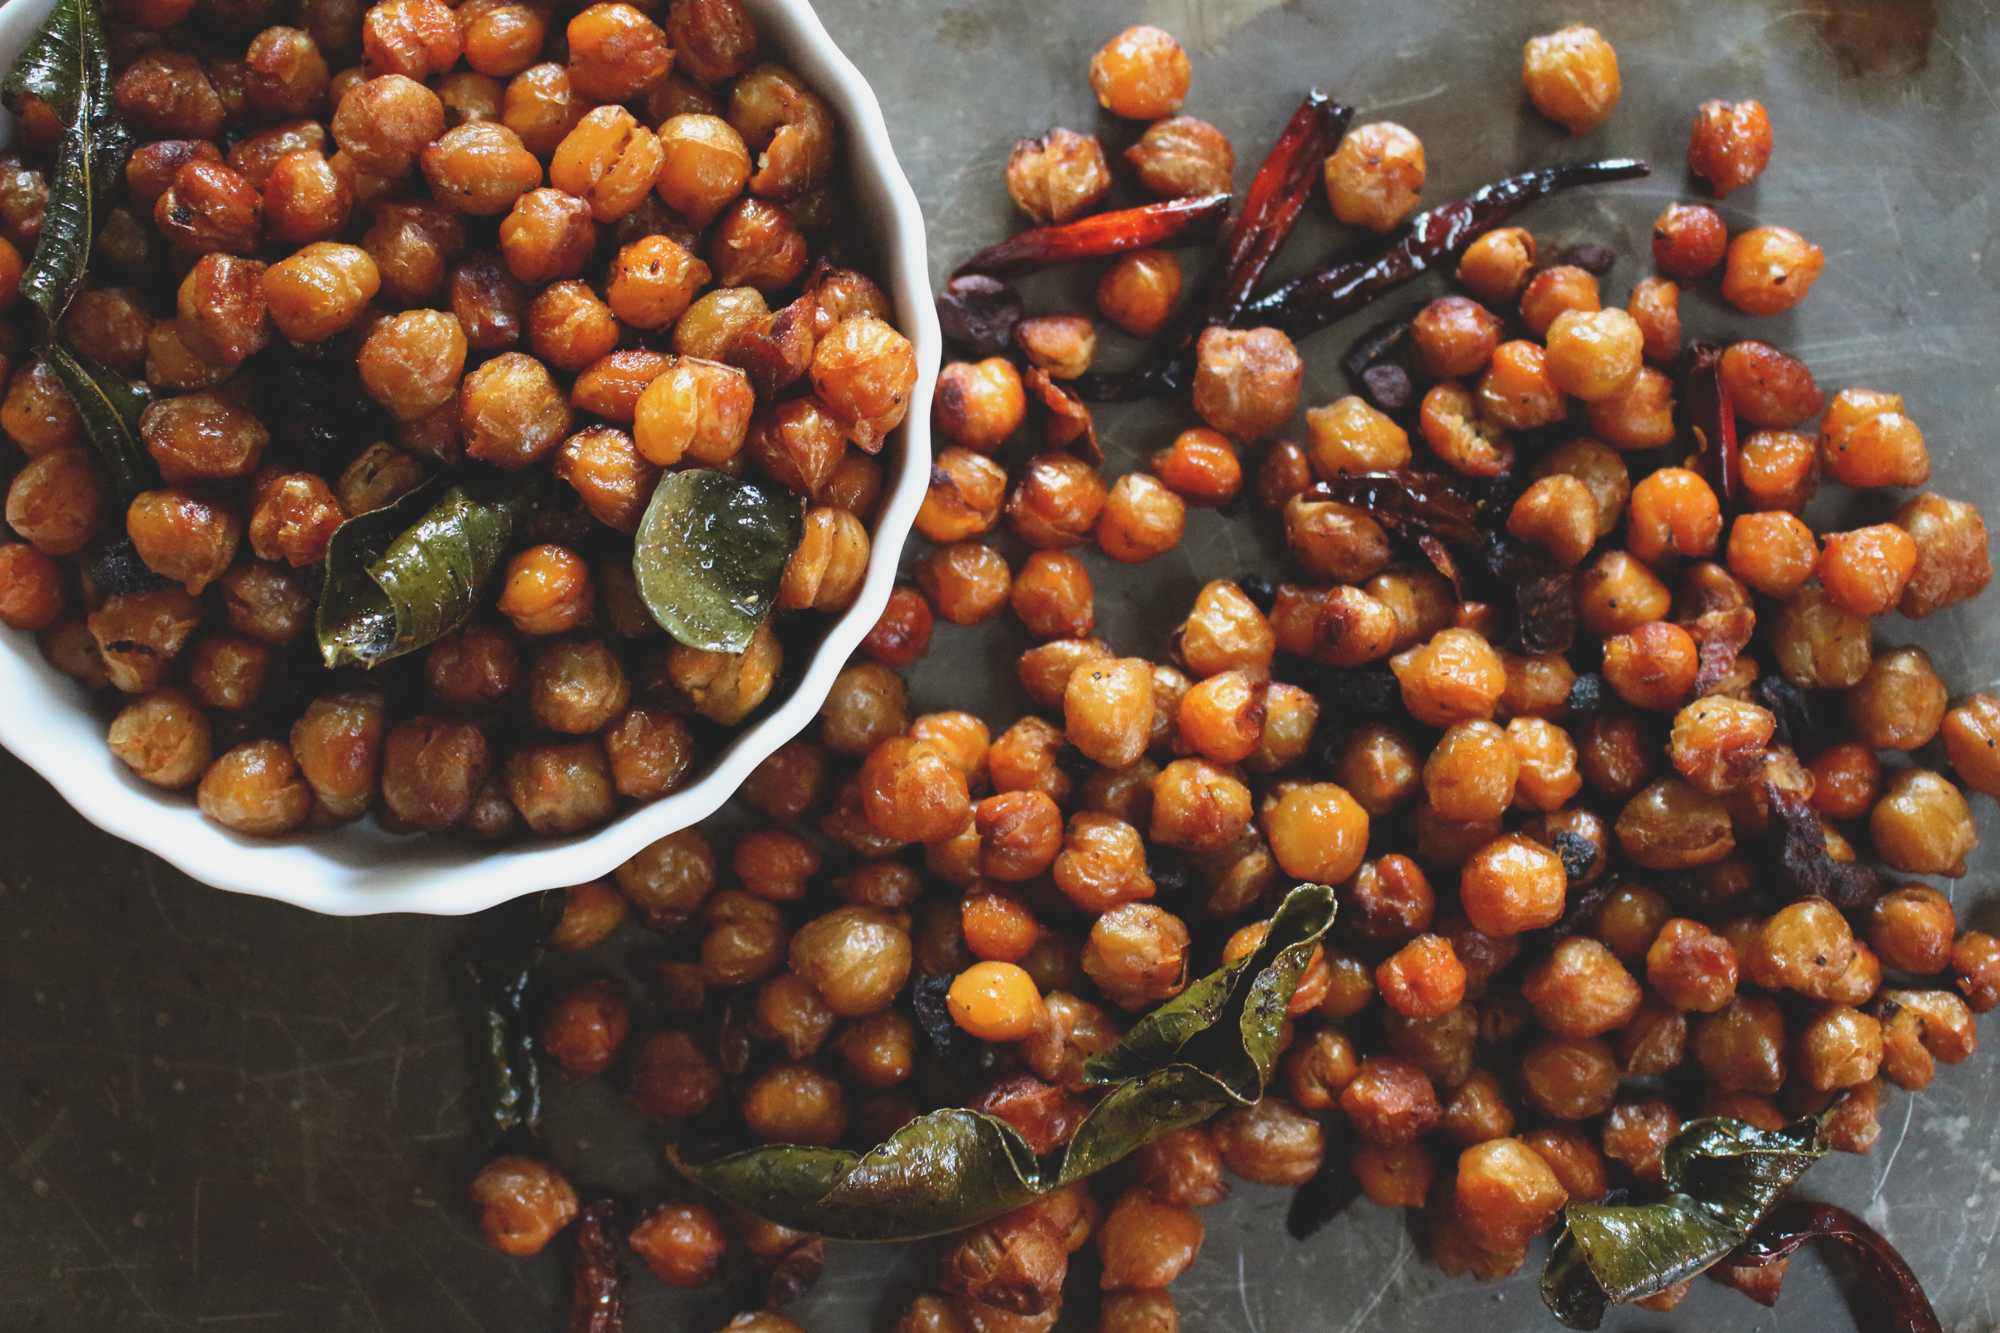 Thai-Spiced Roasted Chickpeas